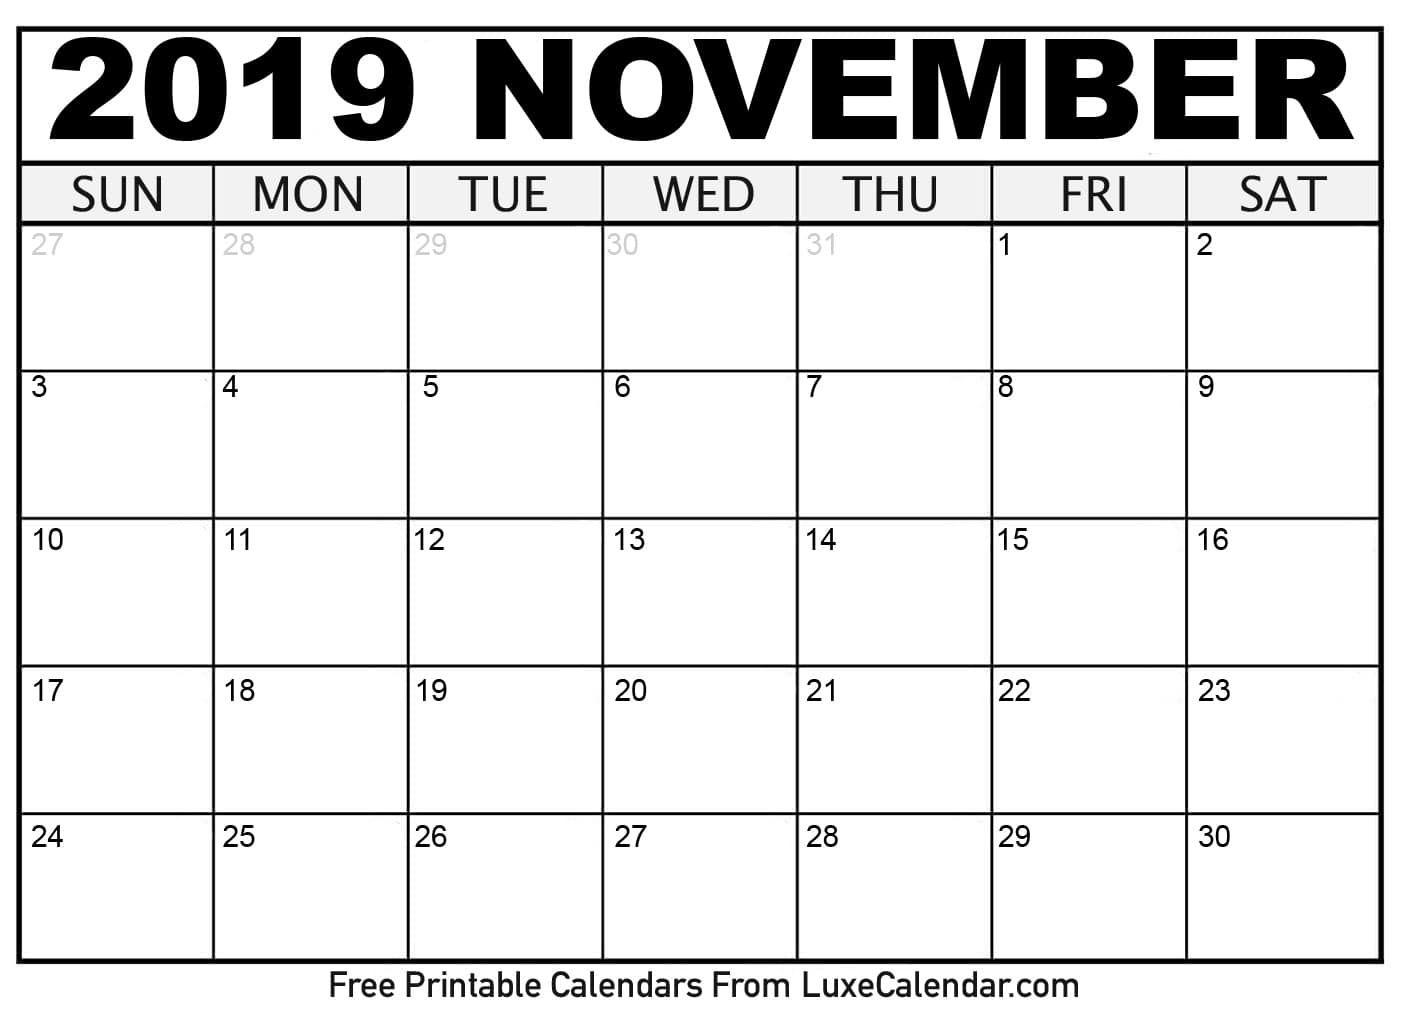 2019 November Calendar Calendar Printables Free Printable